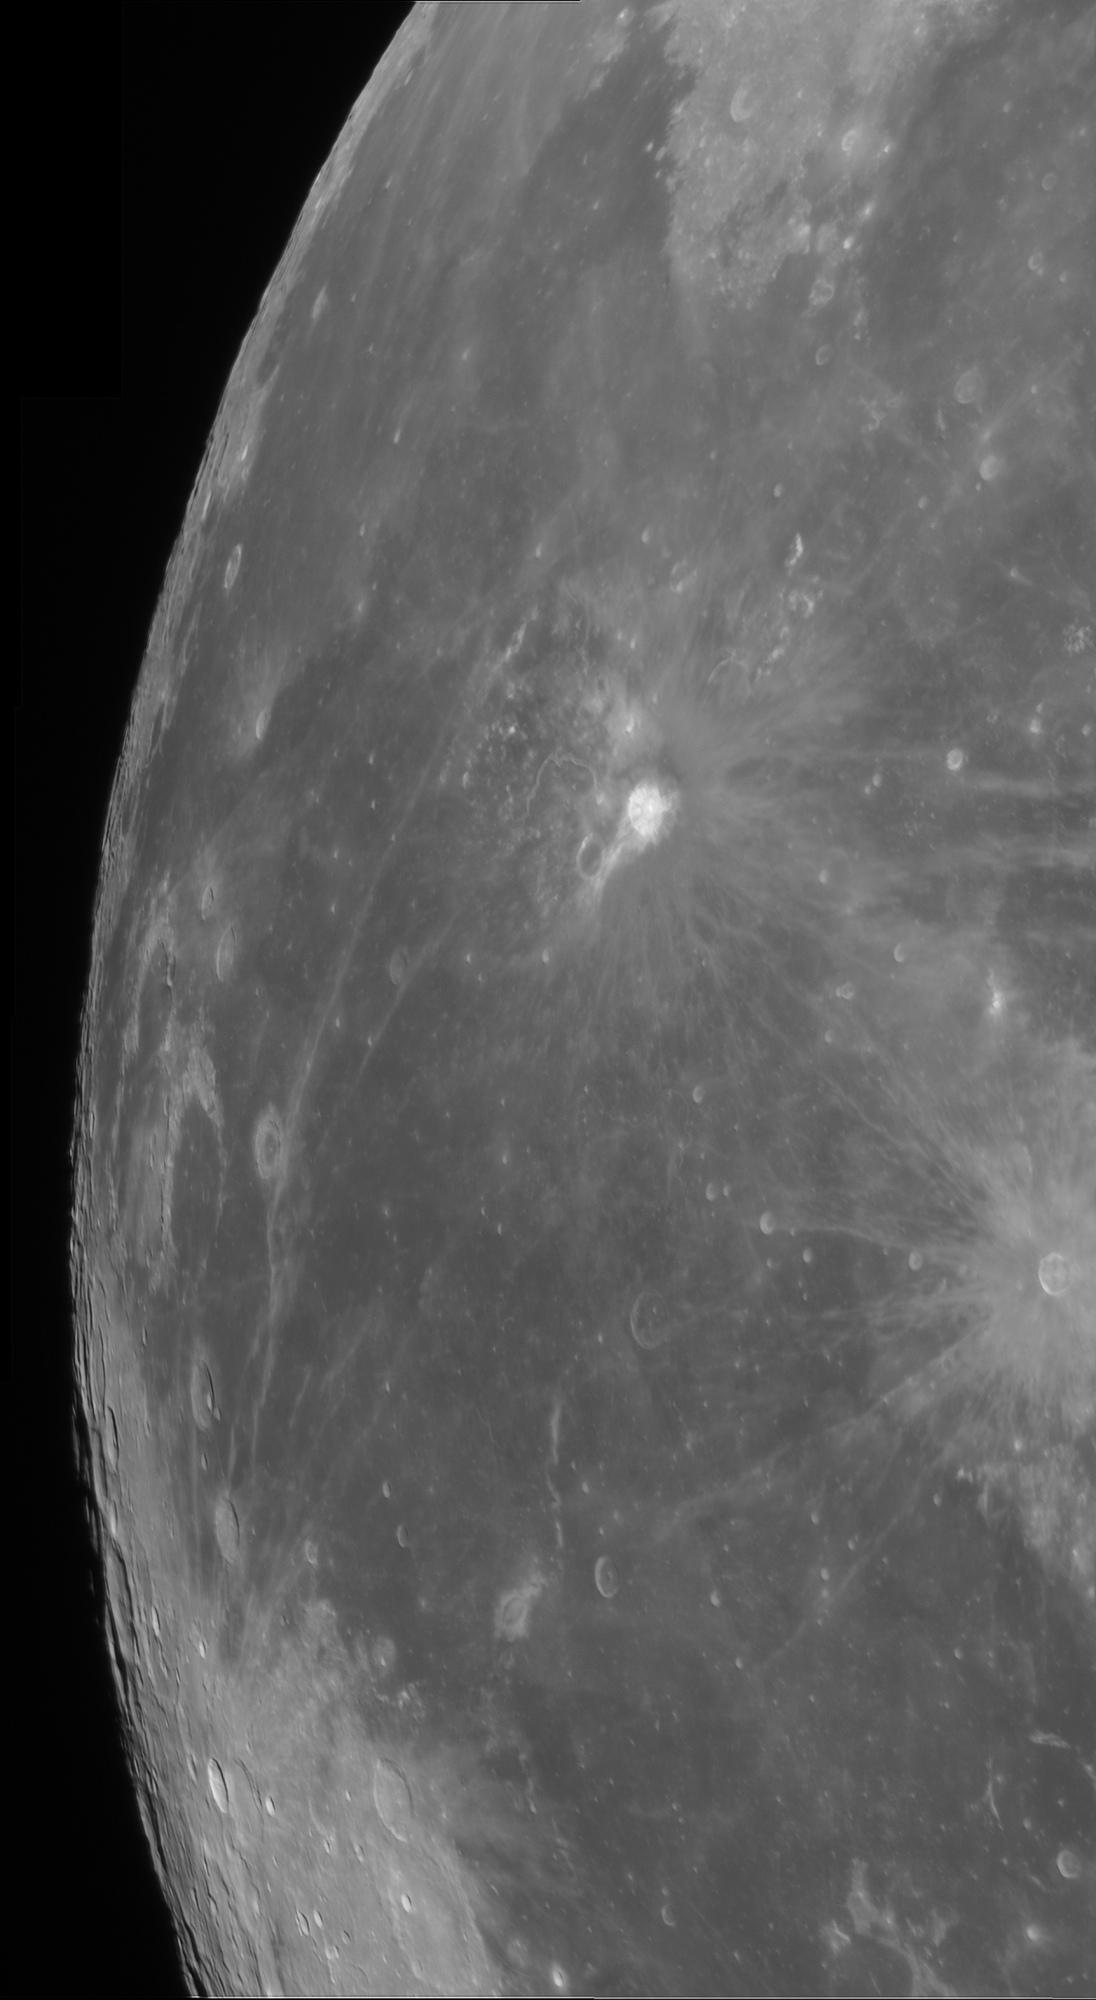 2021-02-26-2118_0-Moon_AS_P25_lapl6_ap2484_stitch.thumb.jpg.9375b0c3a2254a98d781feda4a856997.jpg